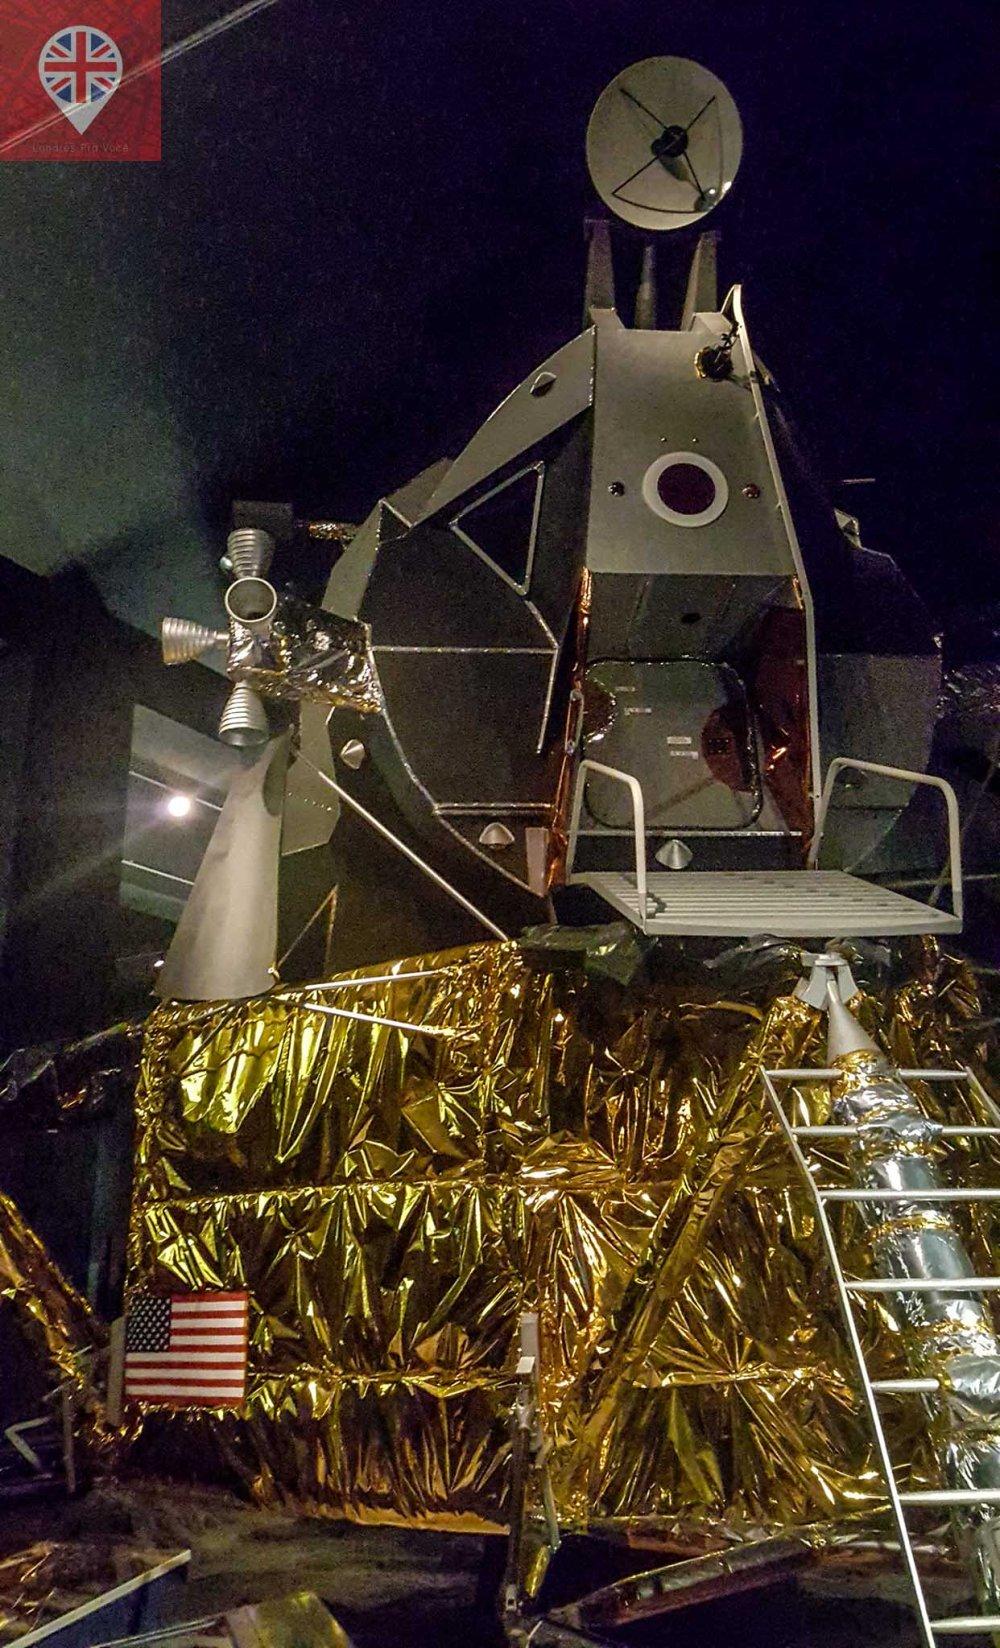 science-museum-eagle-lander